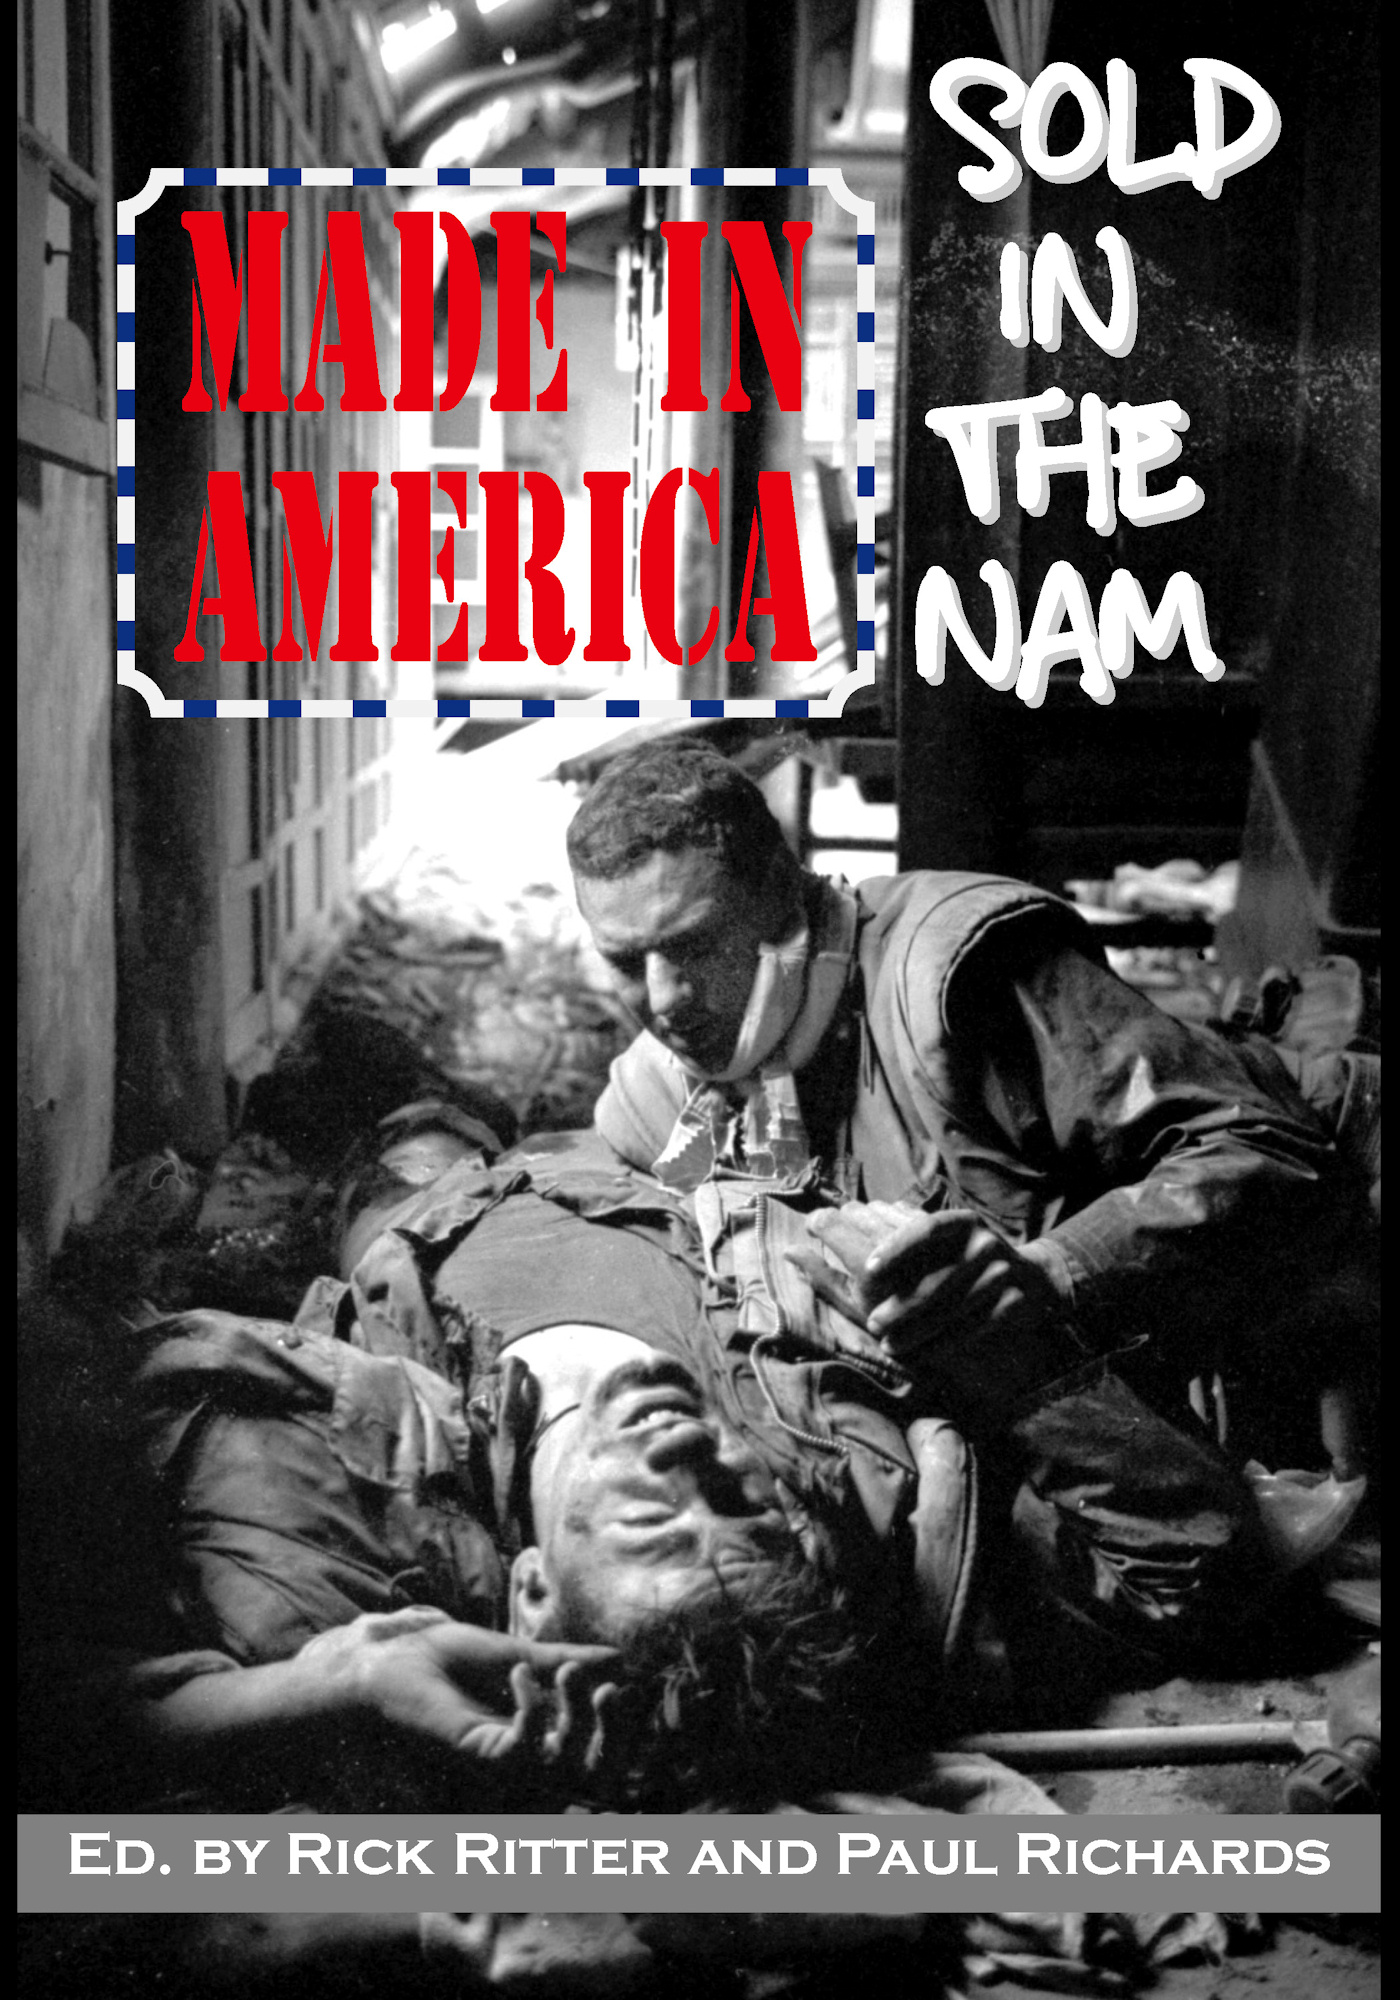 Made in America: Sold in the Nam